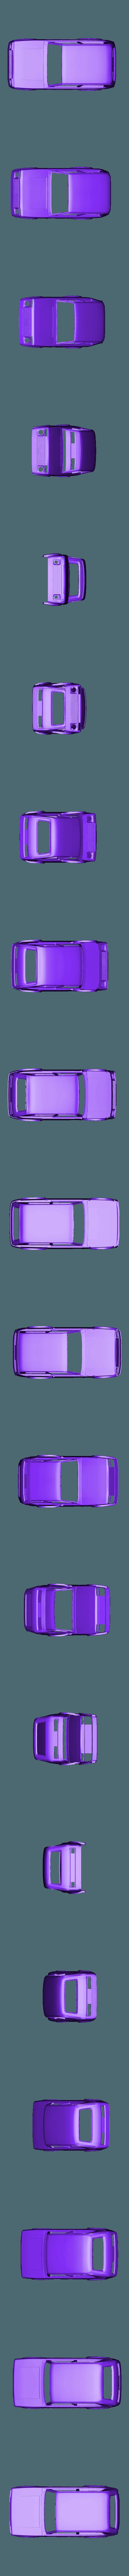 niva full.stl Download STL file Lada Niva  • 3D printing template, serega1337